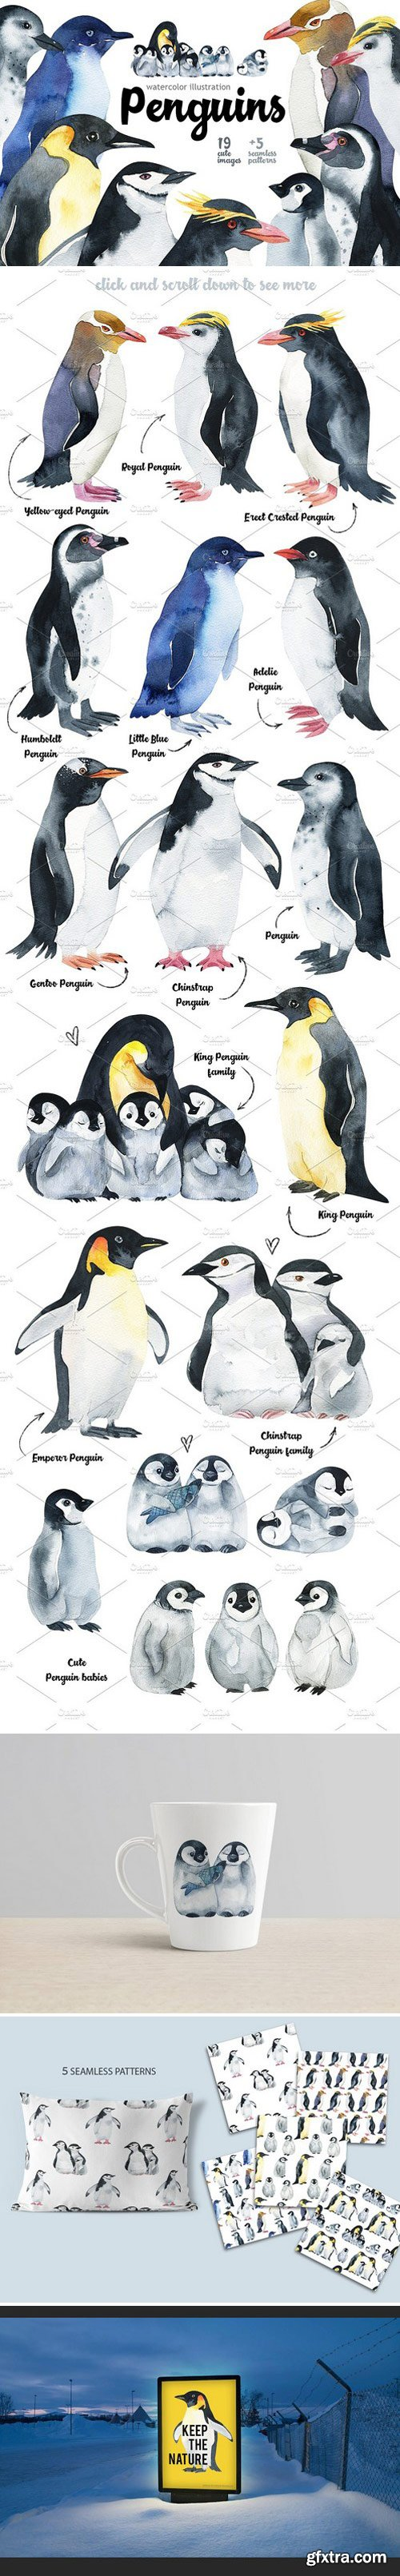 CM - Penguins at the Pole-illustration 2283741